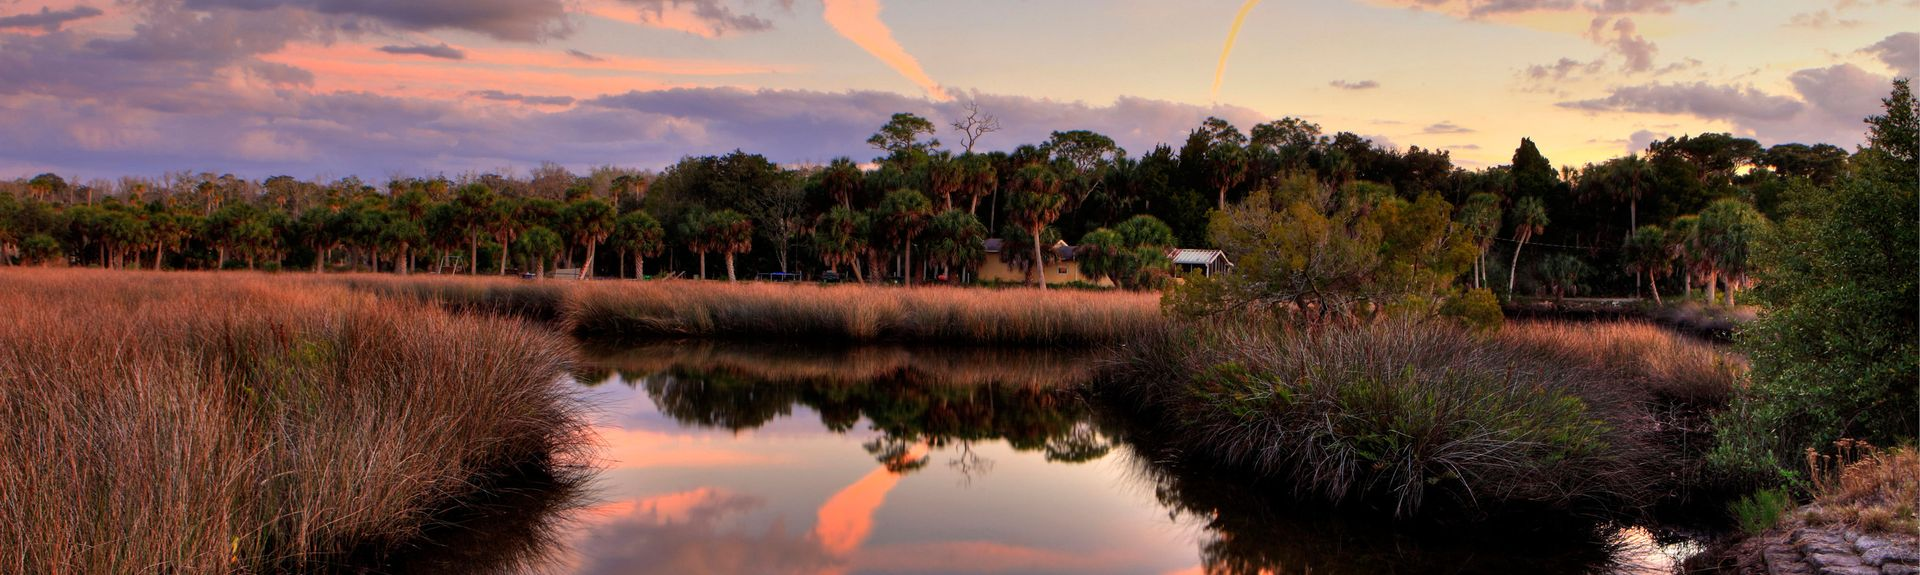 Hernando County, Florida, United States of America